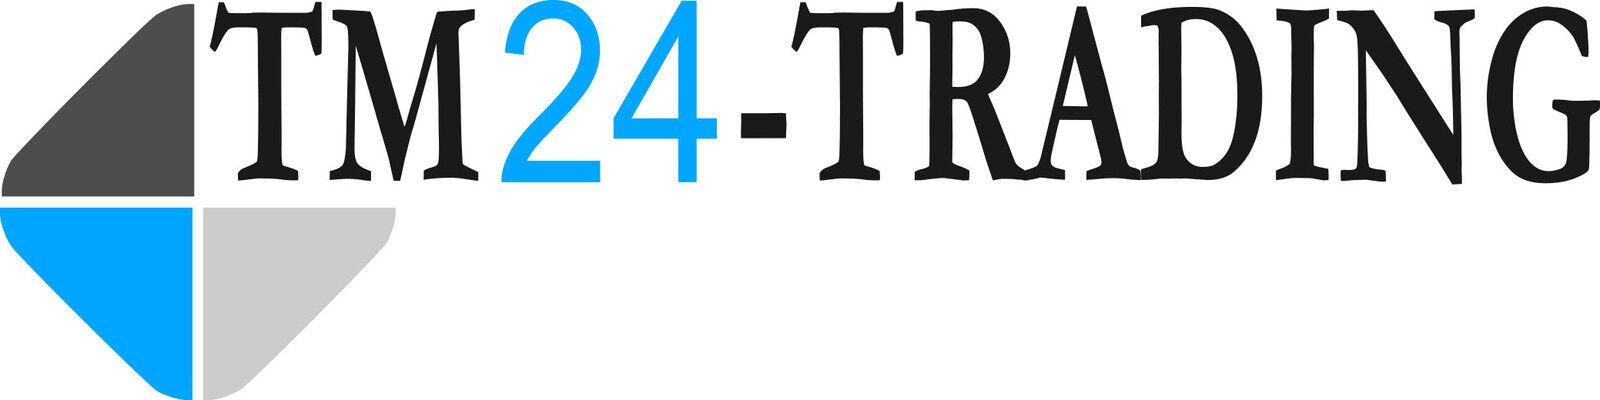 TM24-TRADING